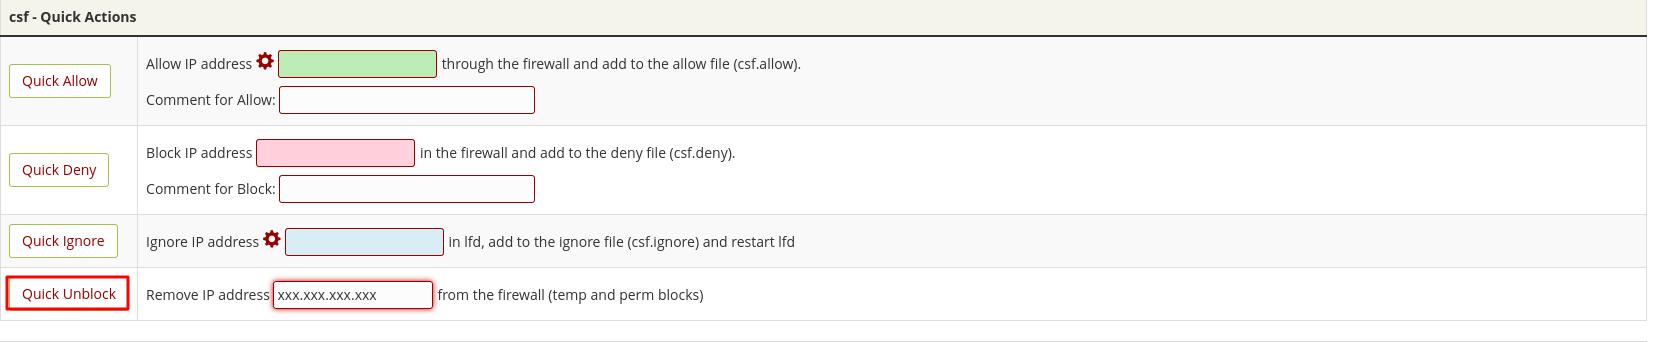 Alternativa para desbloquear ip en WHM